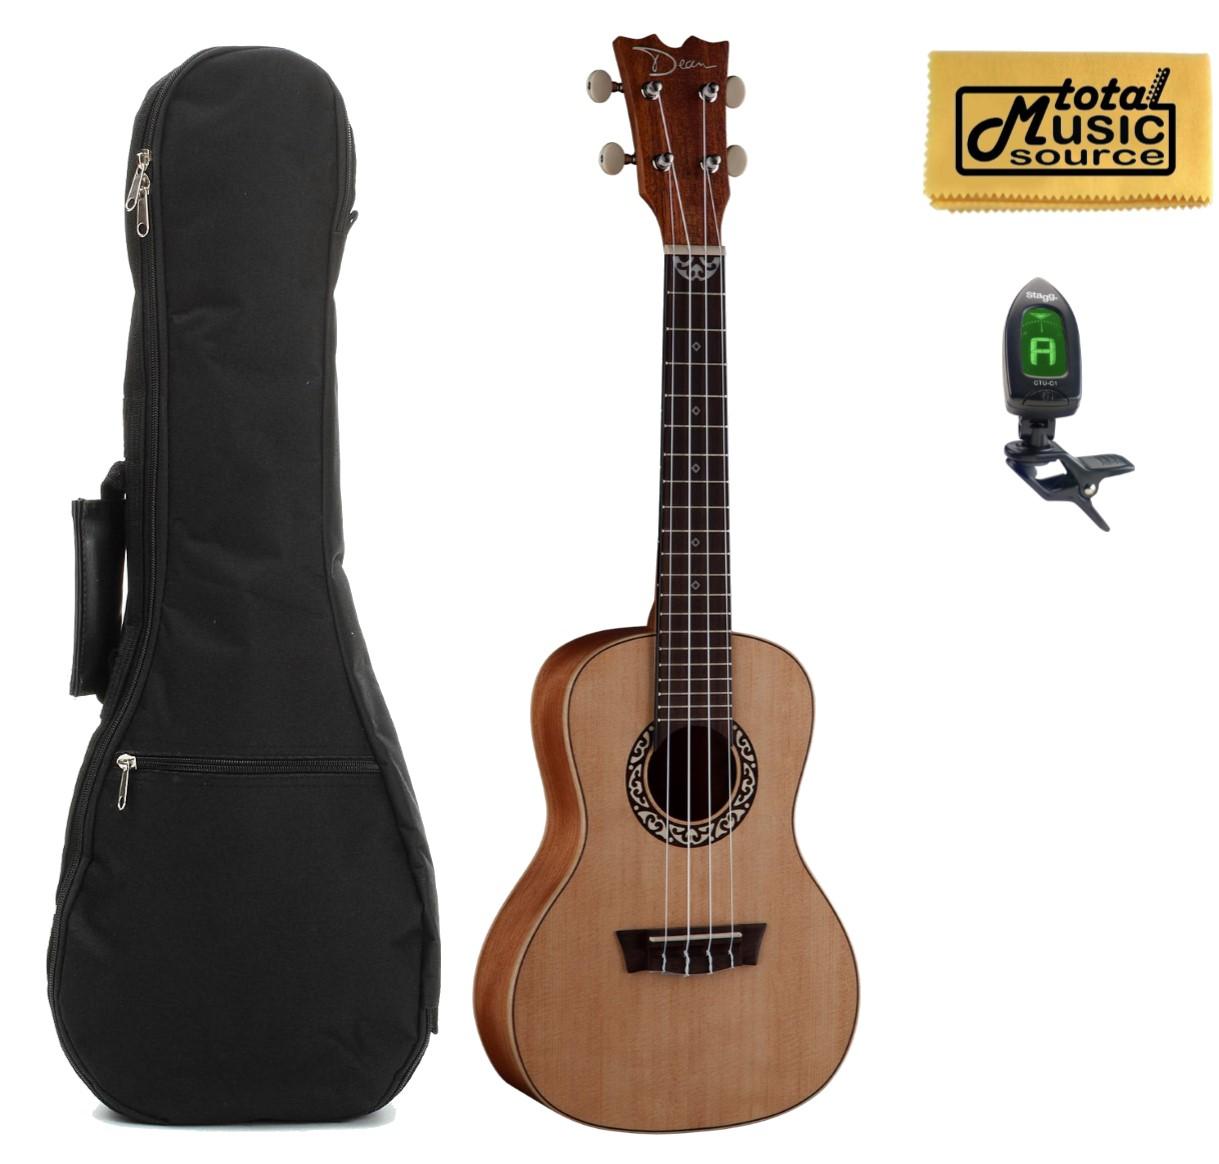 Dean Guitars Concert Spruce Ukulele, Satin Natural w/Padded Gigbag,Tuner & PC ,UKEDCSPR PACK